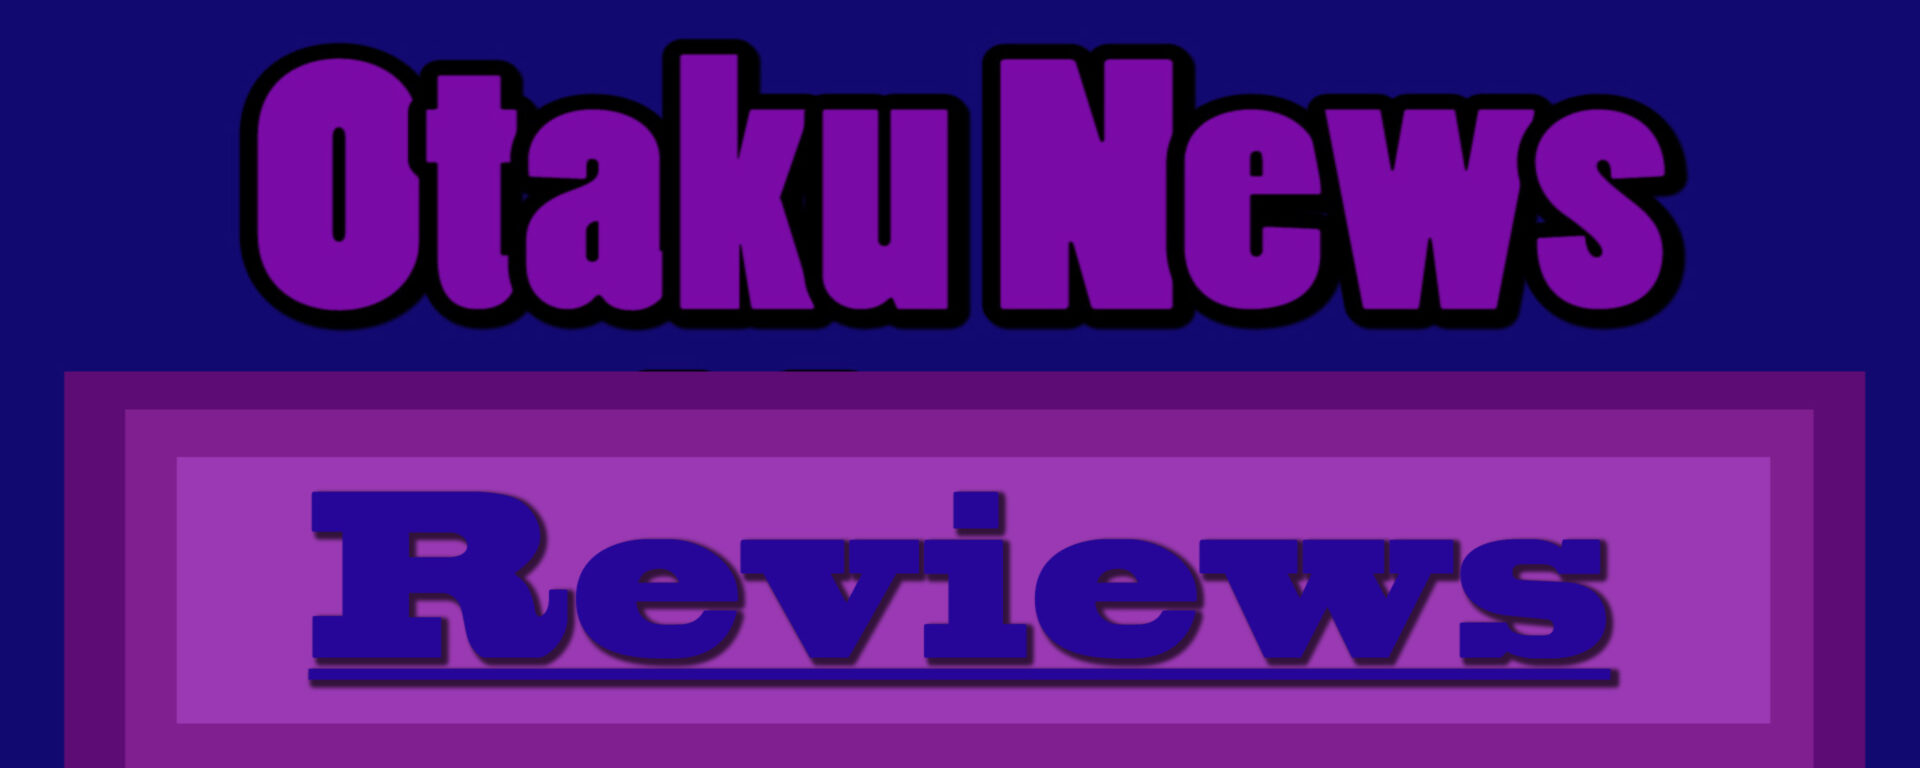 Omega: Destiny Awaken by Jougo Chihaya – Otaku News Reviews